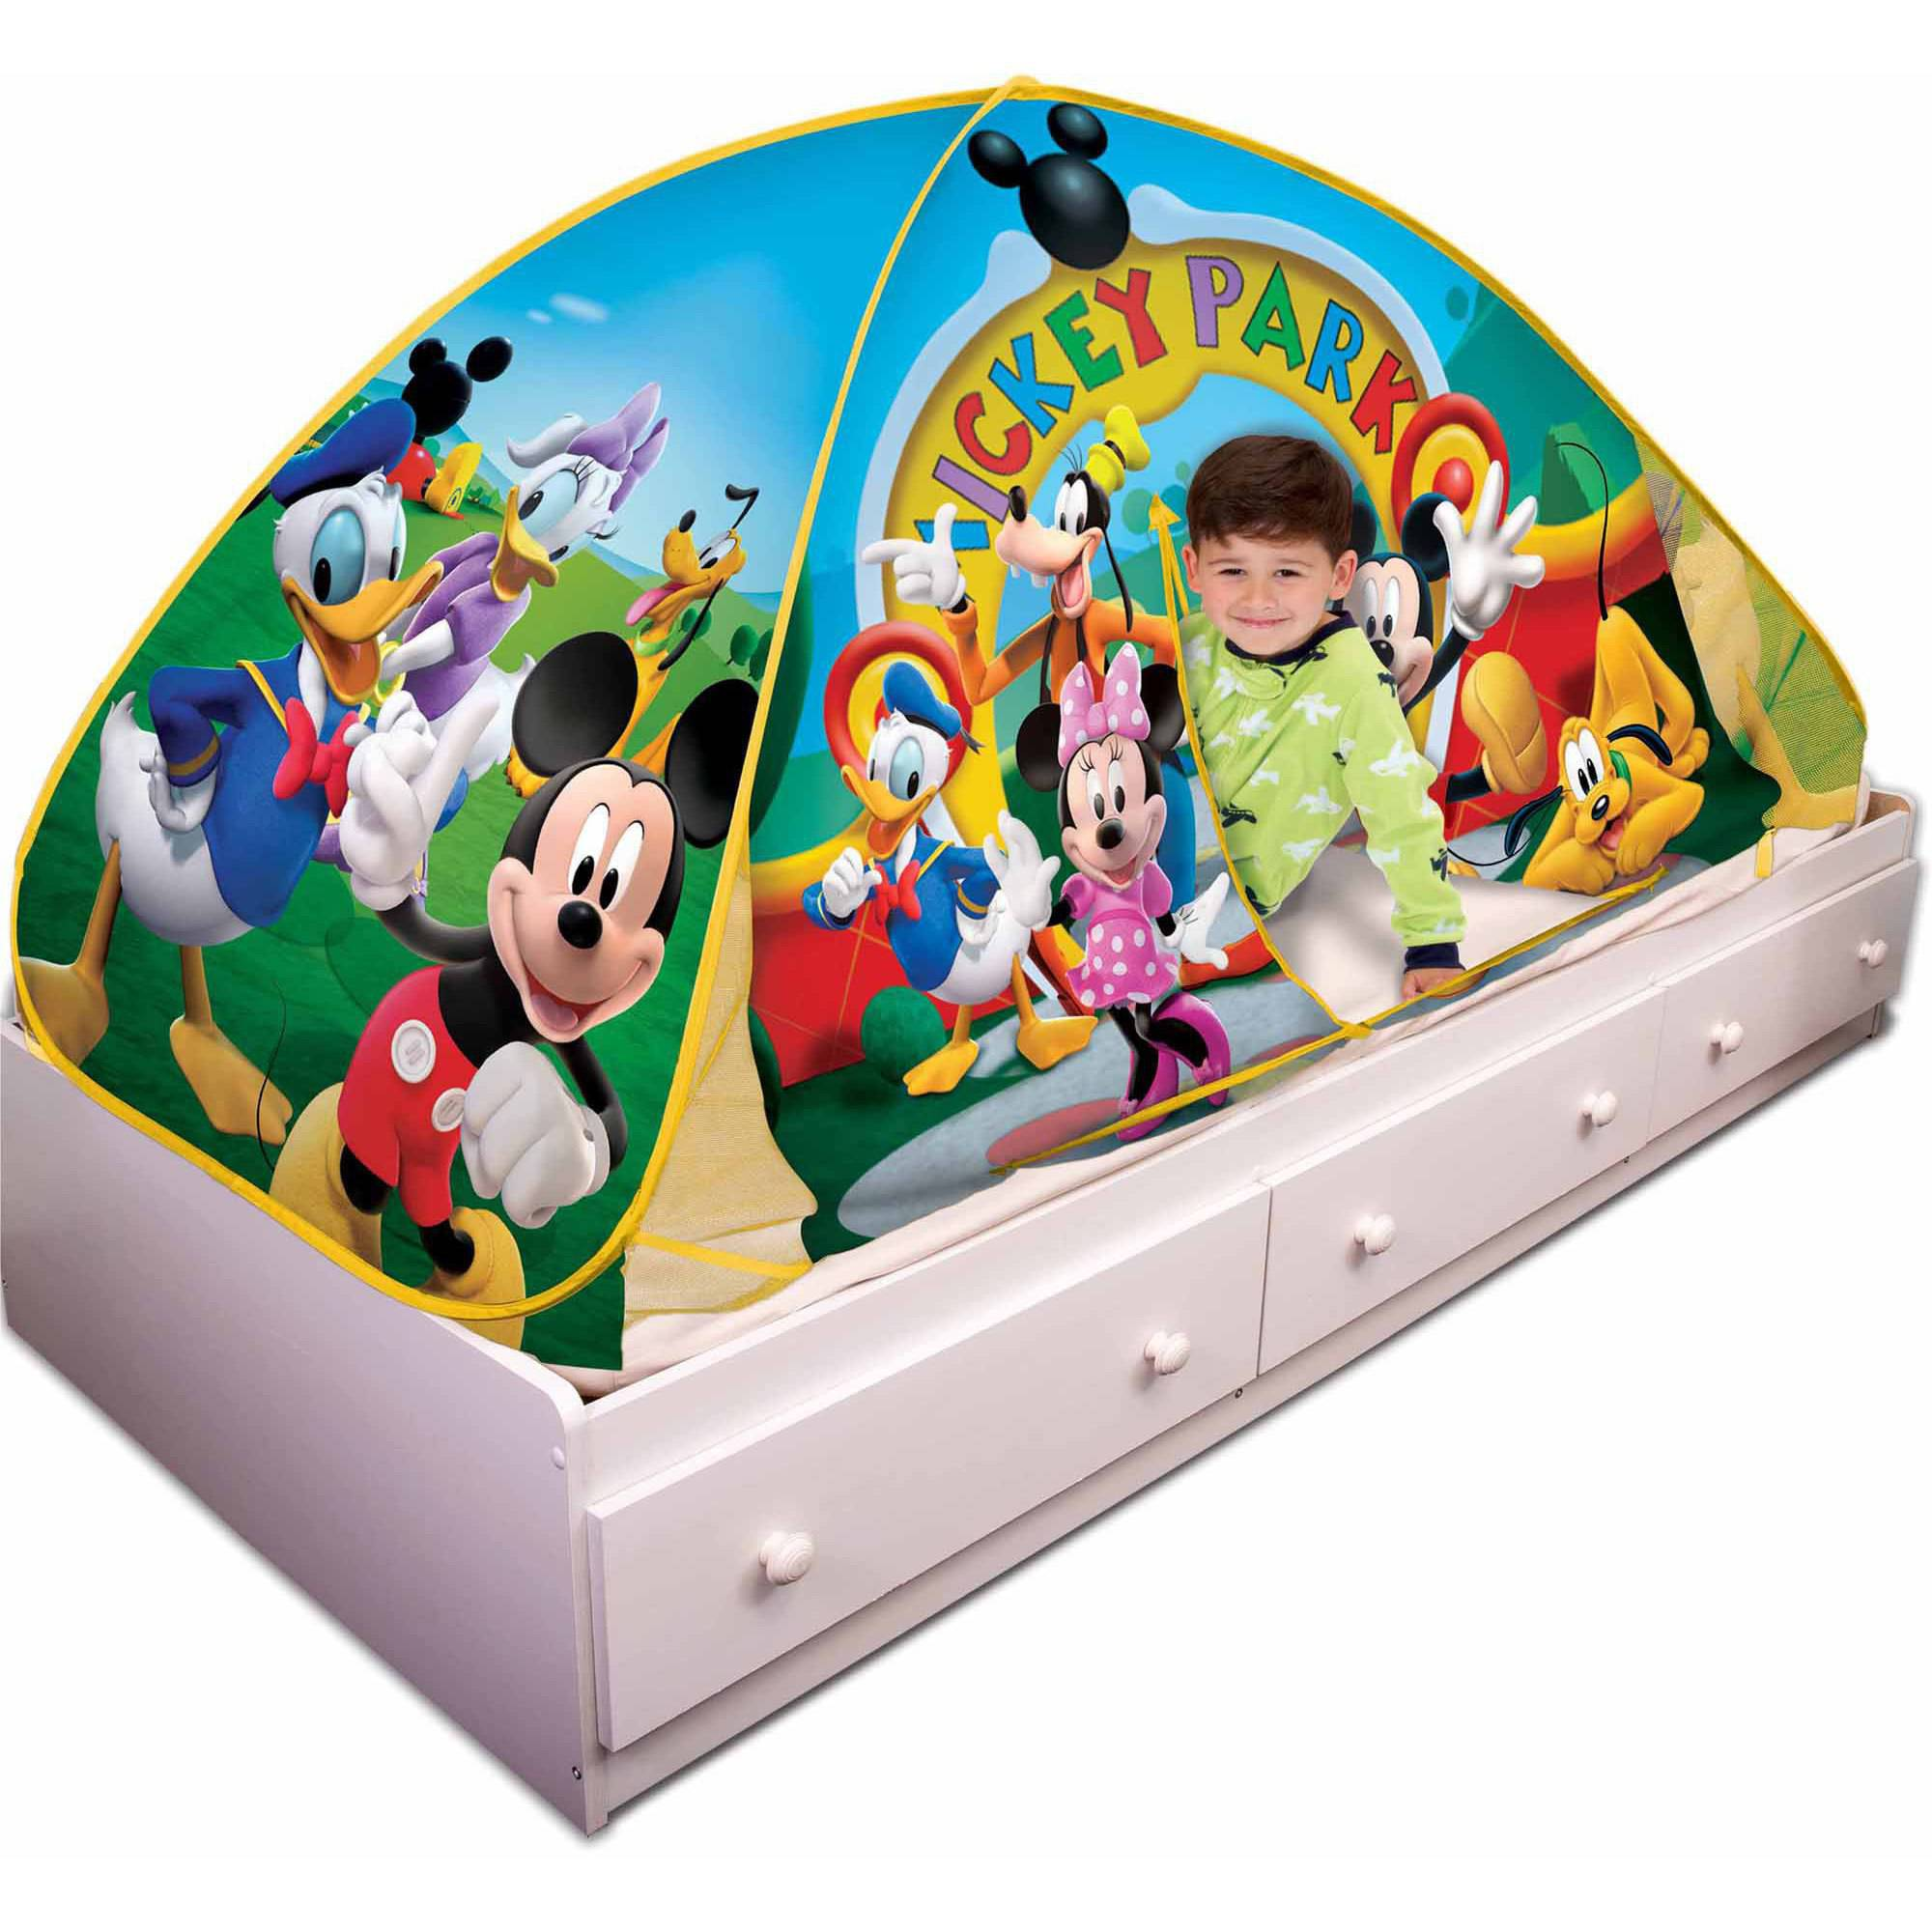 sc 1 st  Walmart & Playhut Disney Mickey Mouse 2-in-1 Tent - Walmart.com